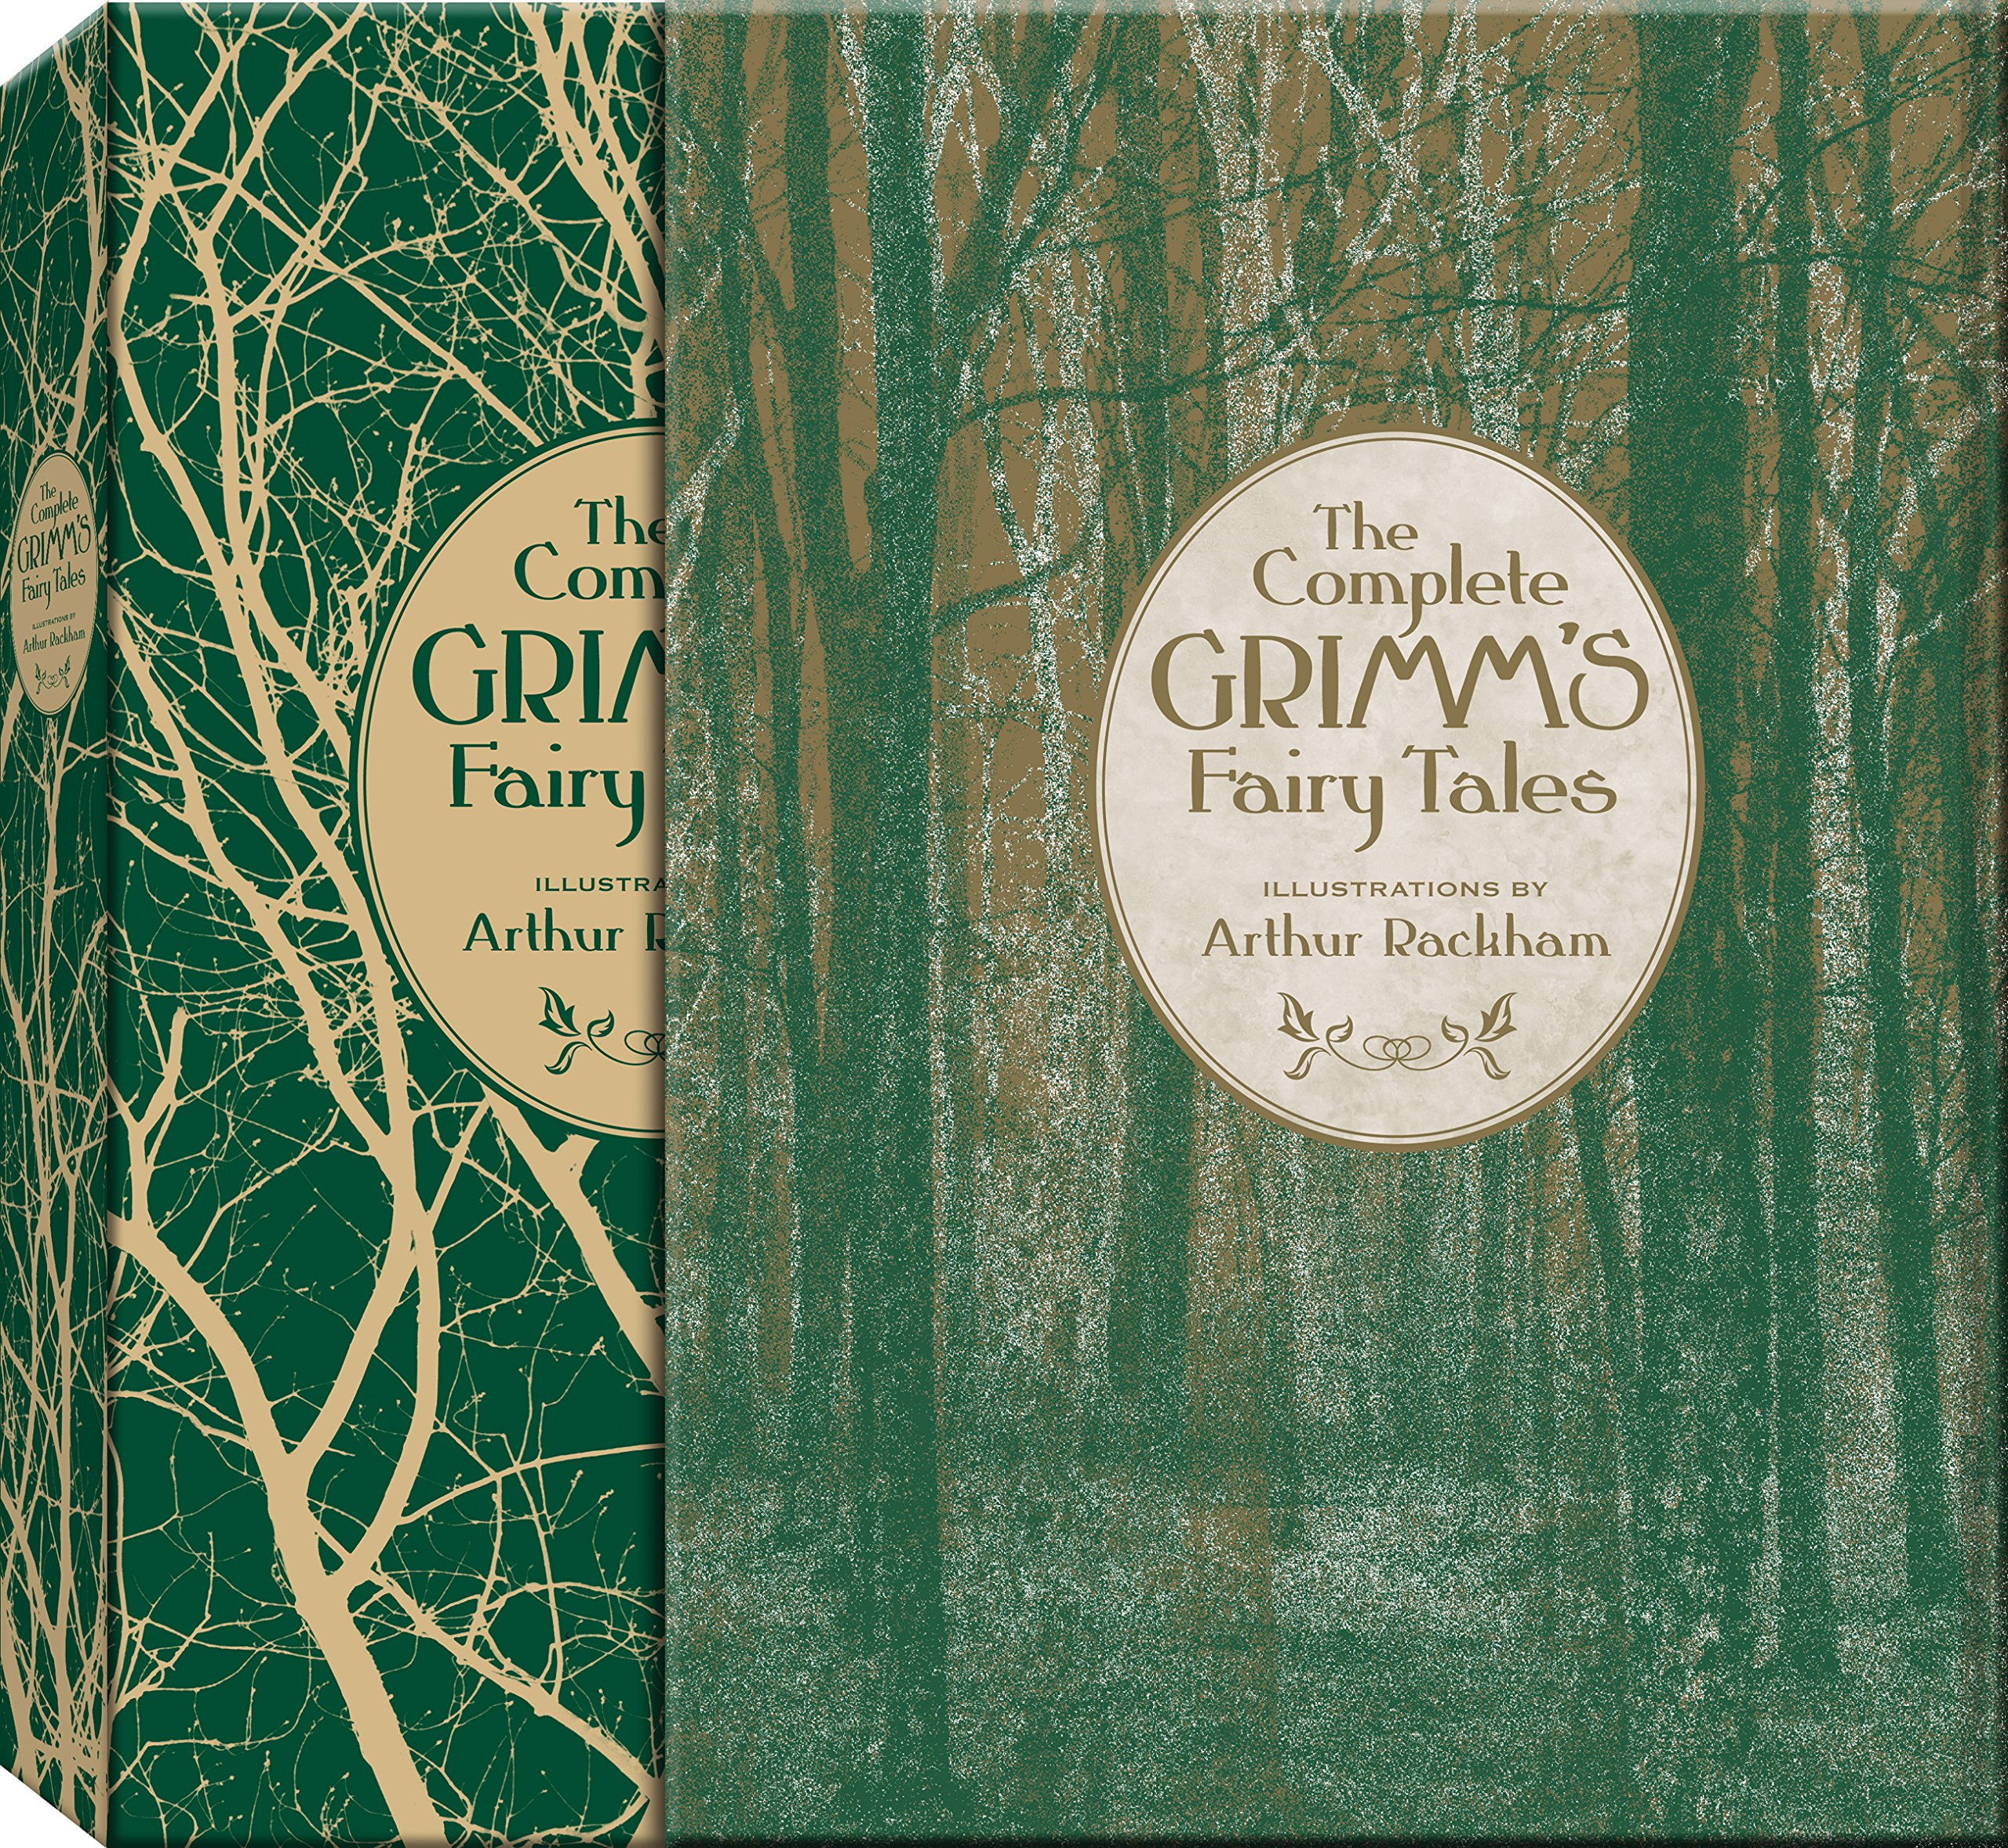 The Complete Grimm's Fairy Tales (Knickerbocker Classics): Jacob Grimm,  Wilhelm Grimm: 9781937994310: Amazon.com: Books